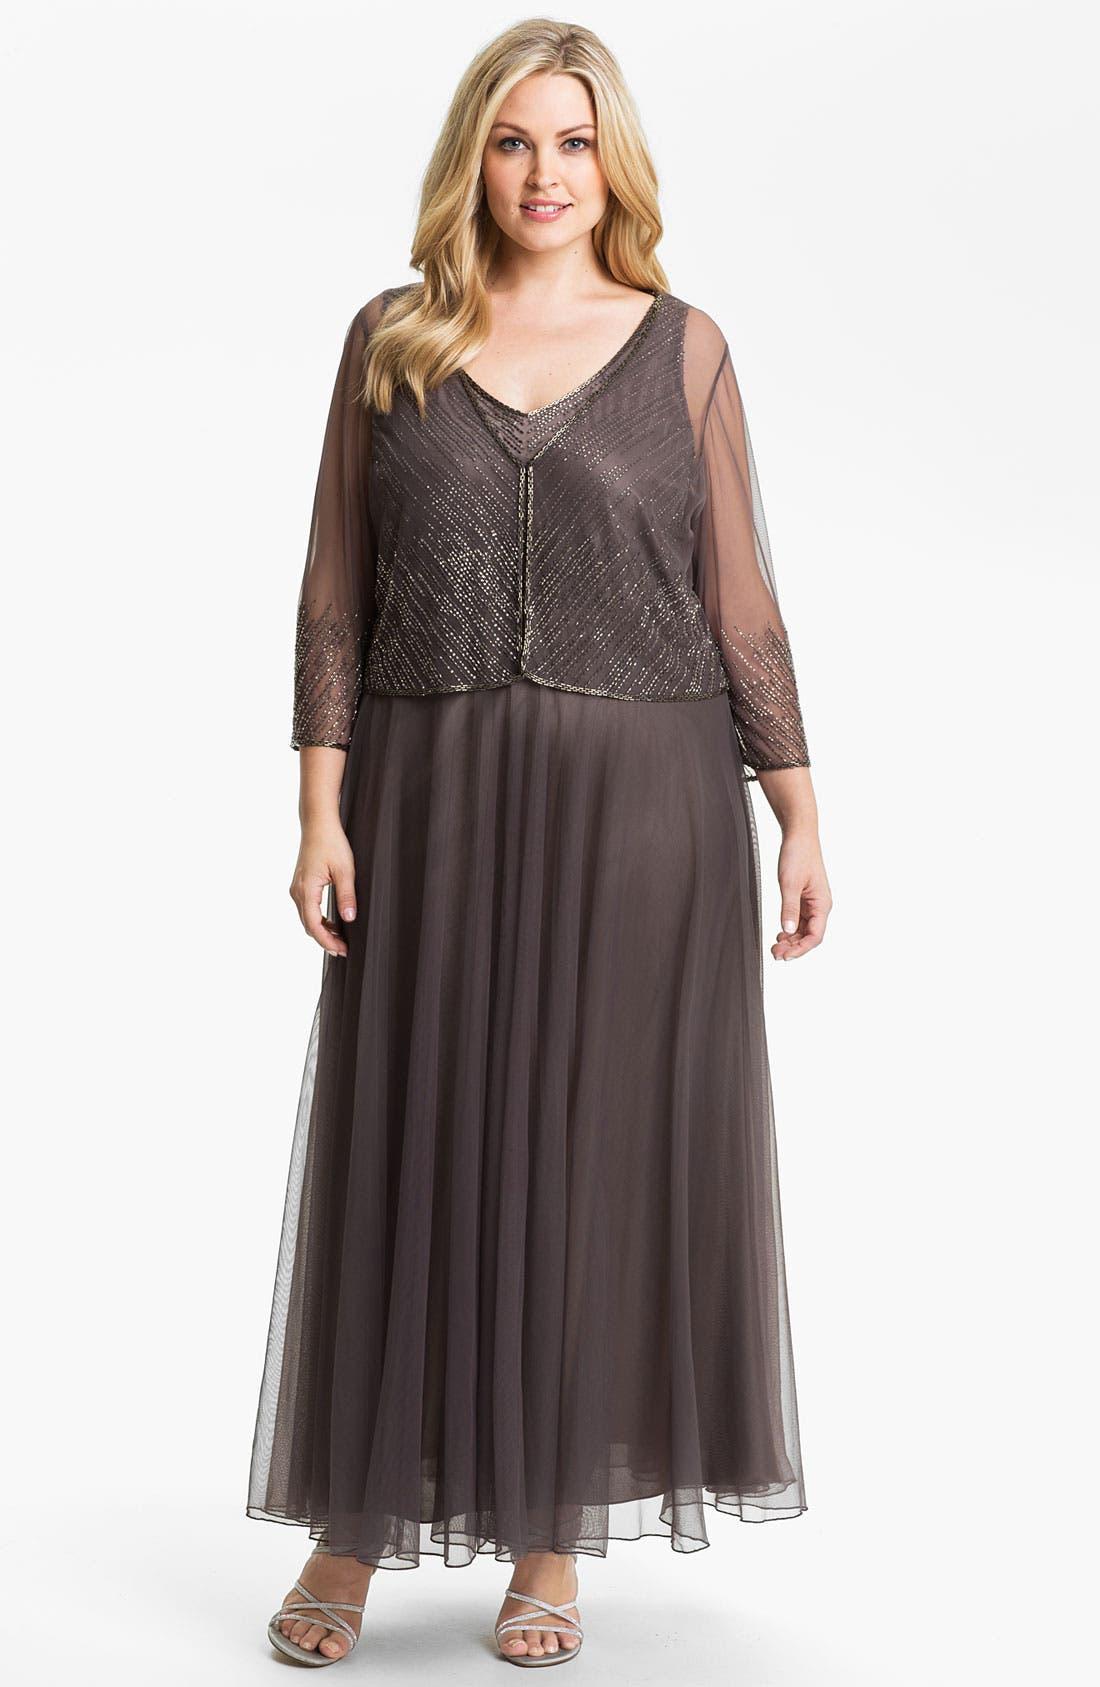 Main Image - J Kara Beaded Chiffon Dress & Jacket (Plus)